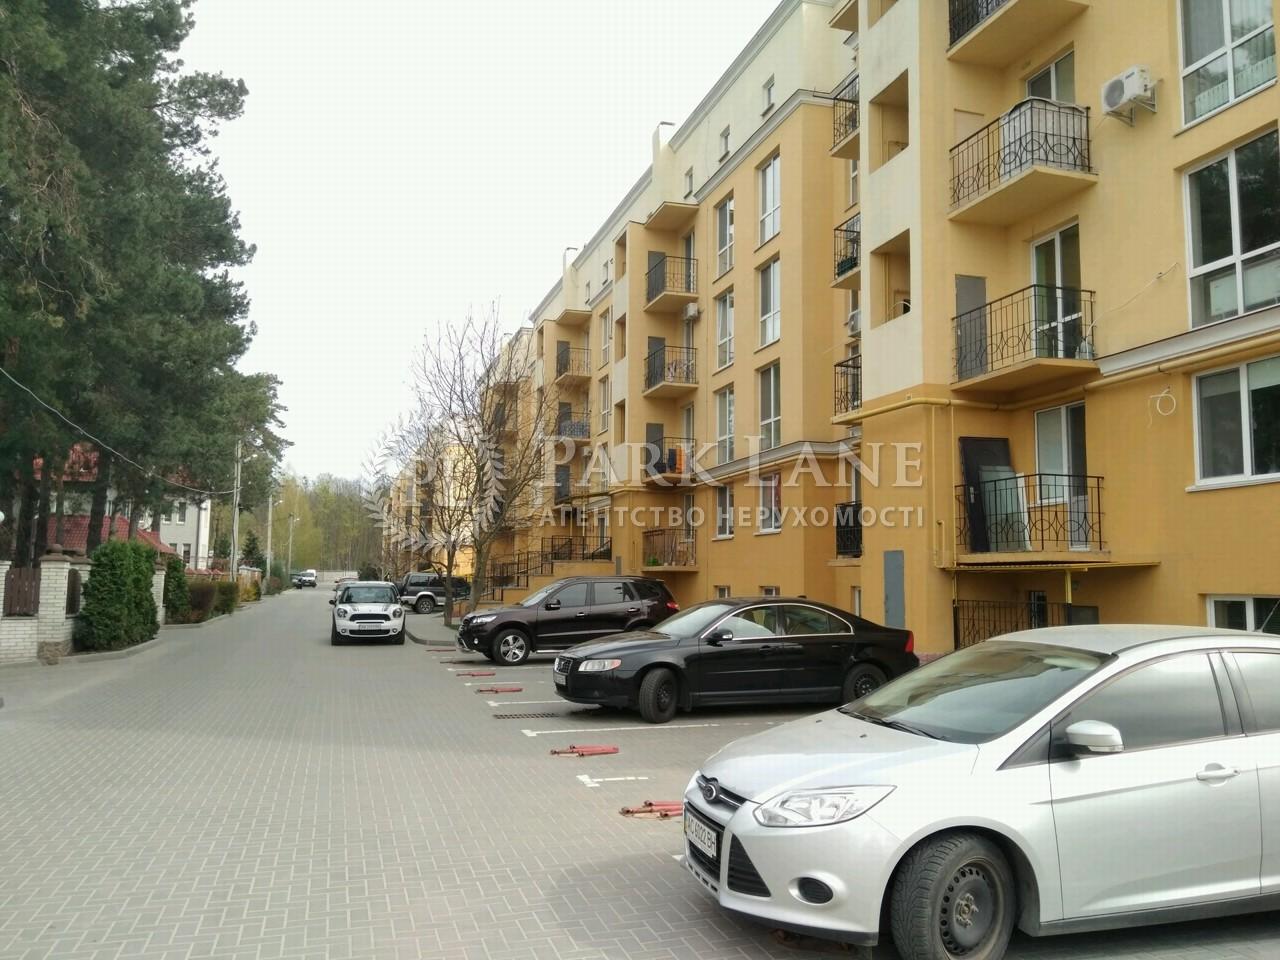 Квартира ул. Печерская, 24, Чайки, Z-702040 - Фото 1